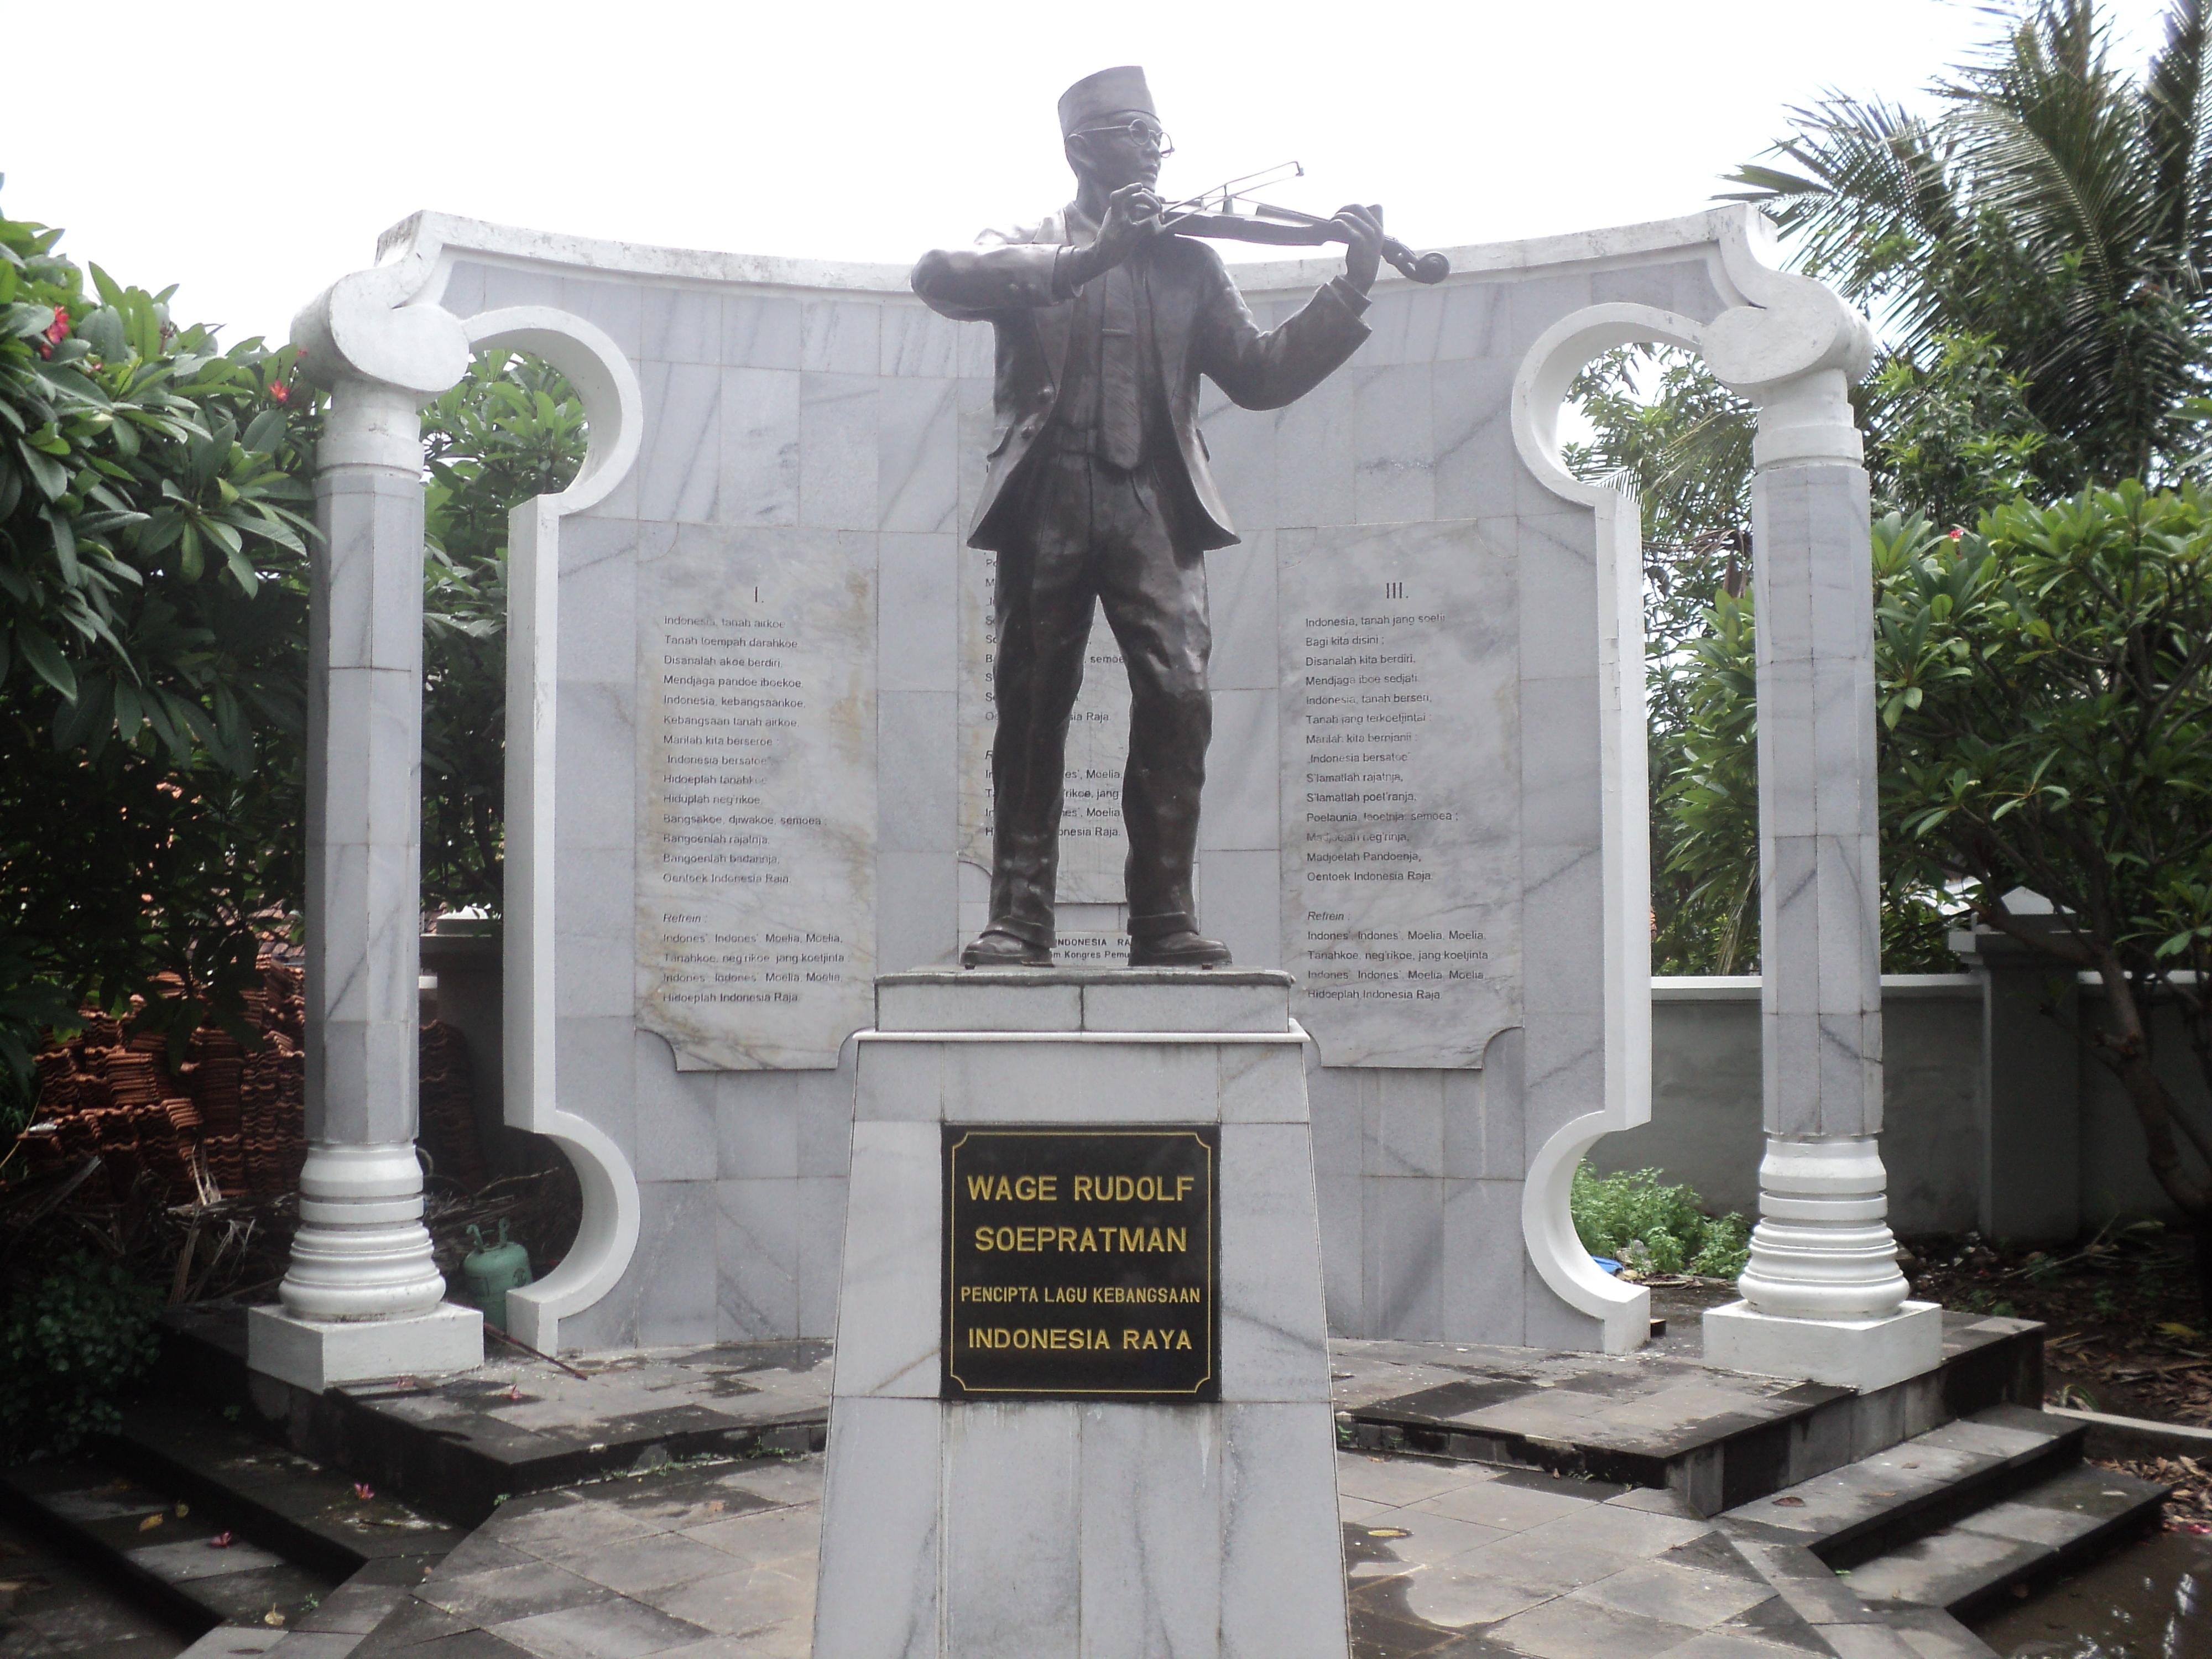 Monumen Surabaya Laman 3 Wr Supratman Wisata Pahlawan Kota